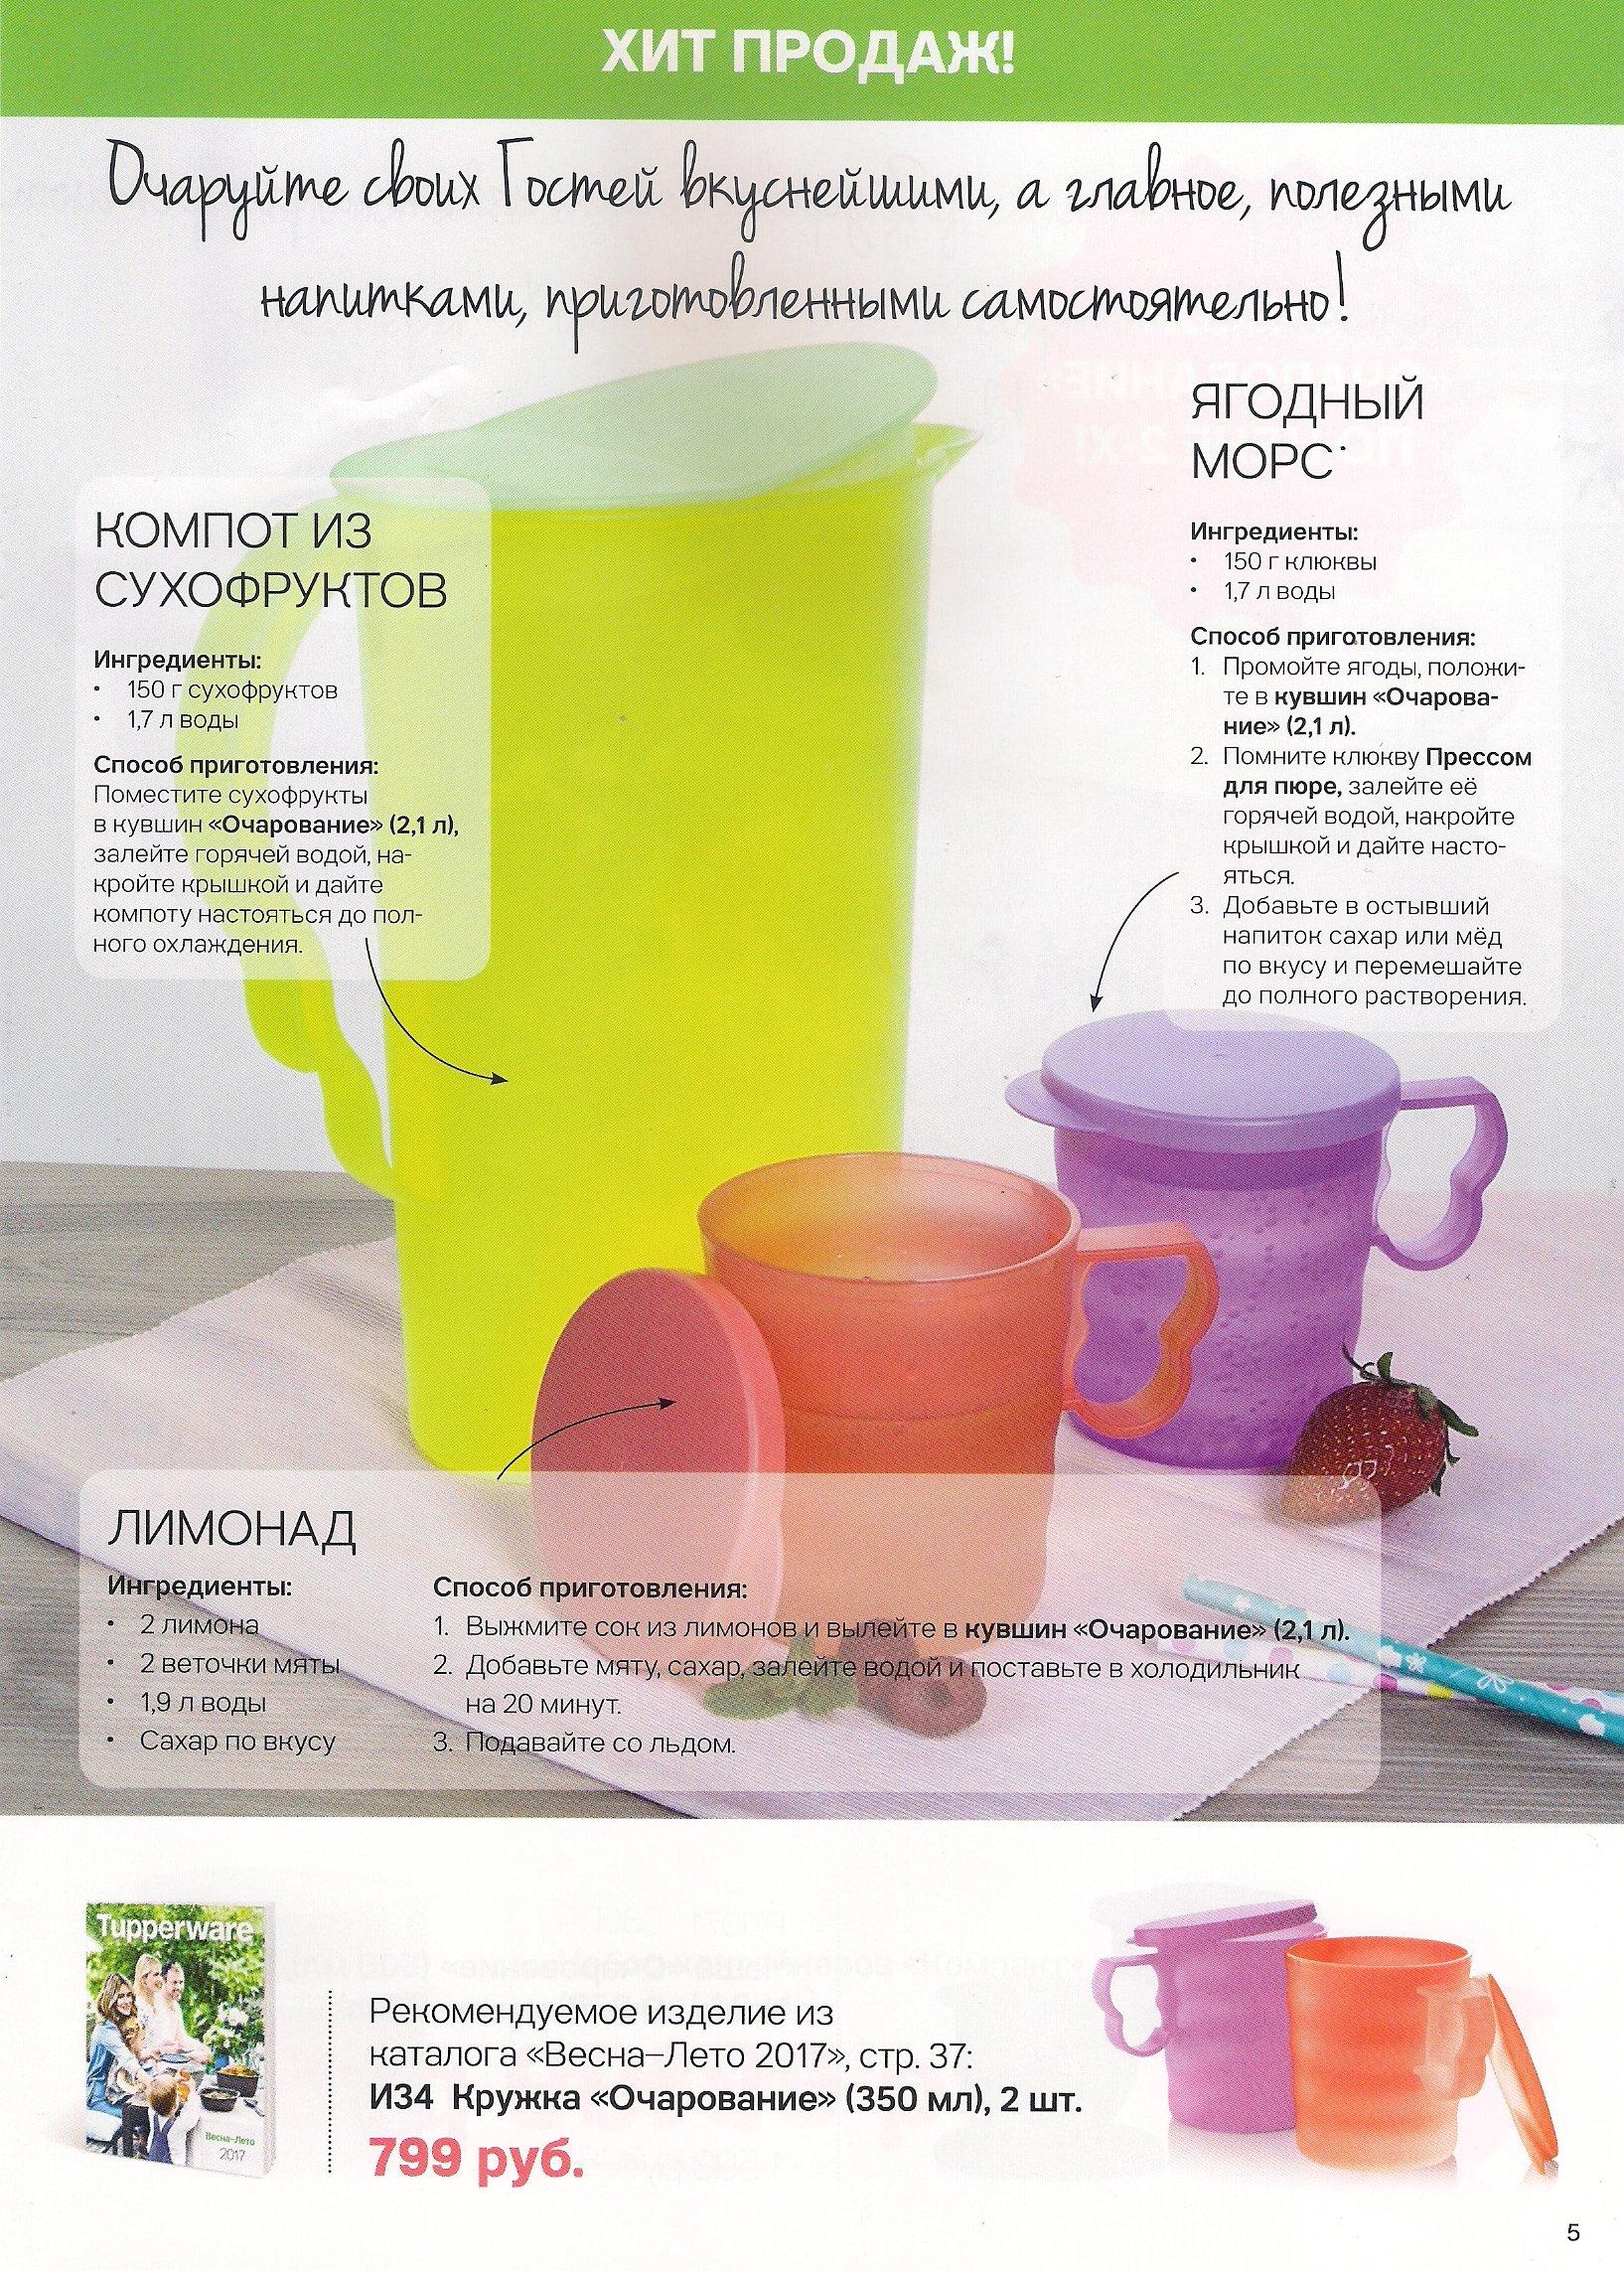 https://tupperware-online.ru/images/upload/5i.jpg